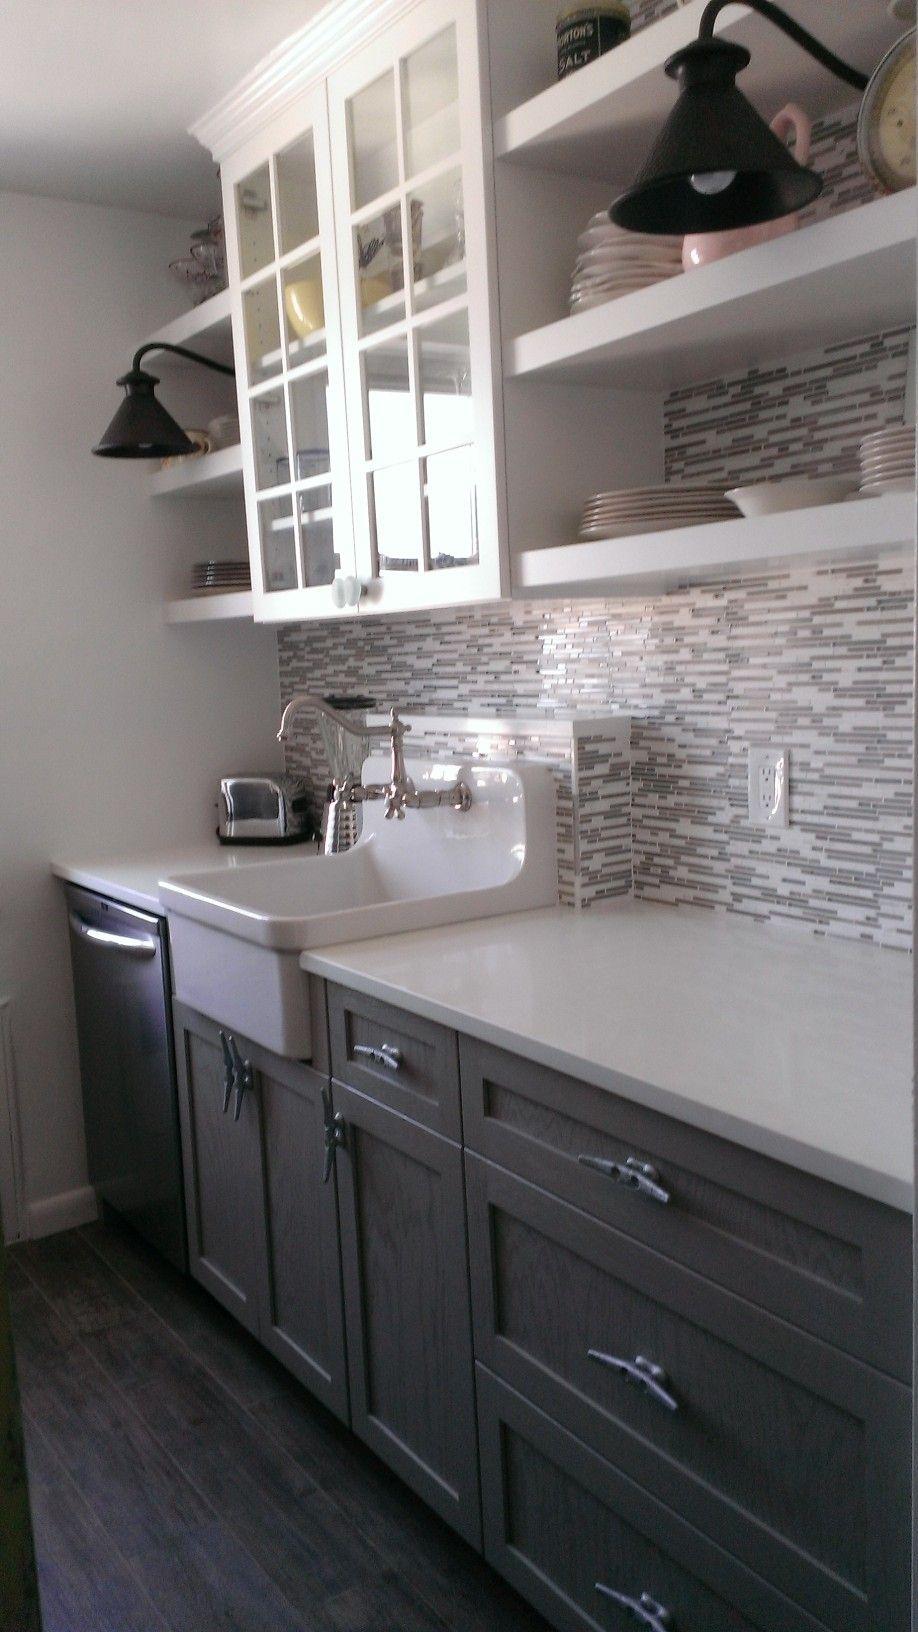 White Quartz Counter Tops Open Shelving Tile Floors Farmhouse Sink Diy Countertops